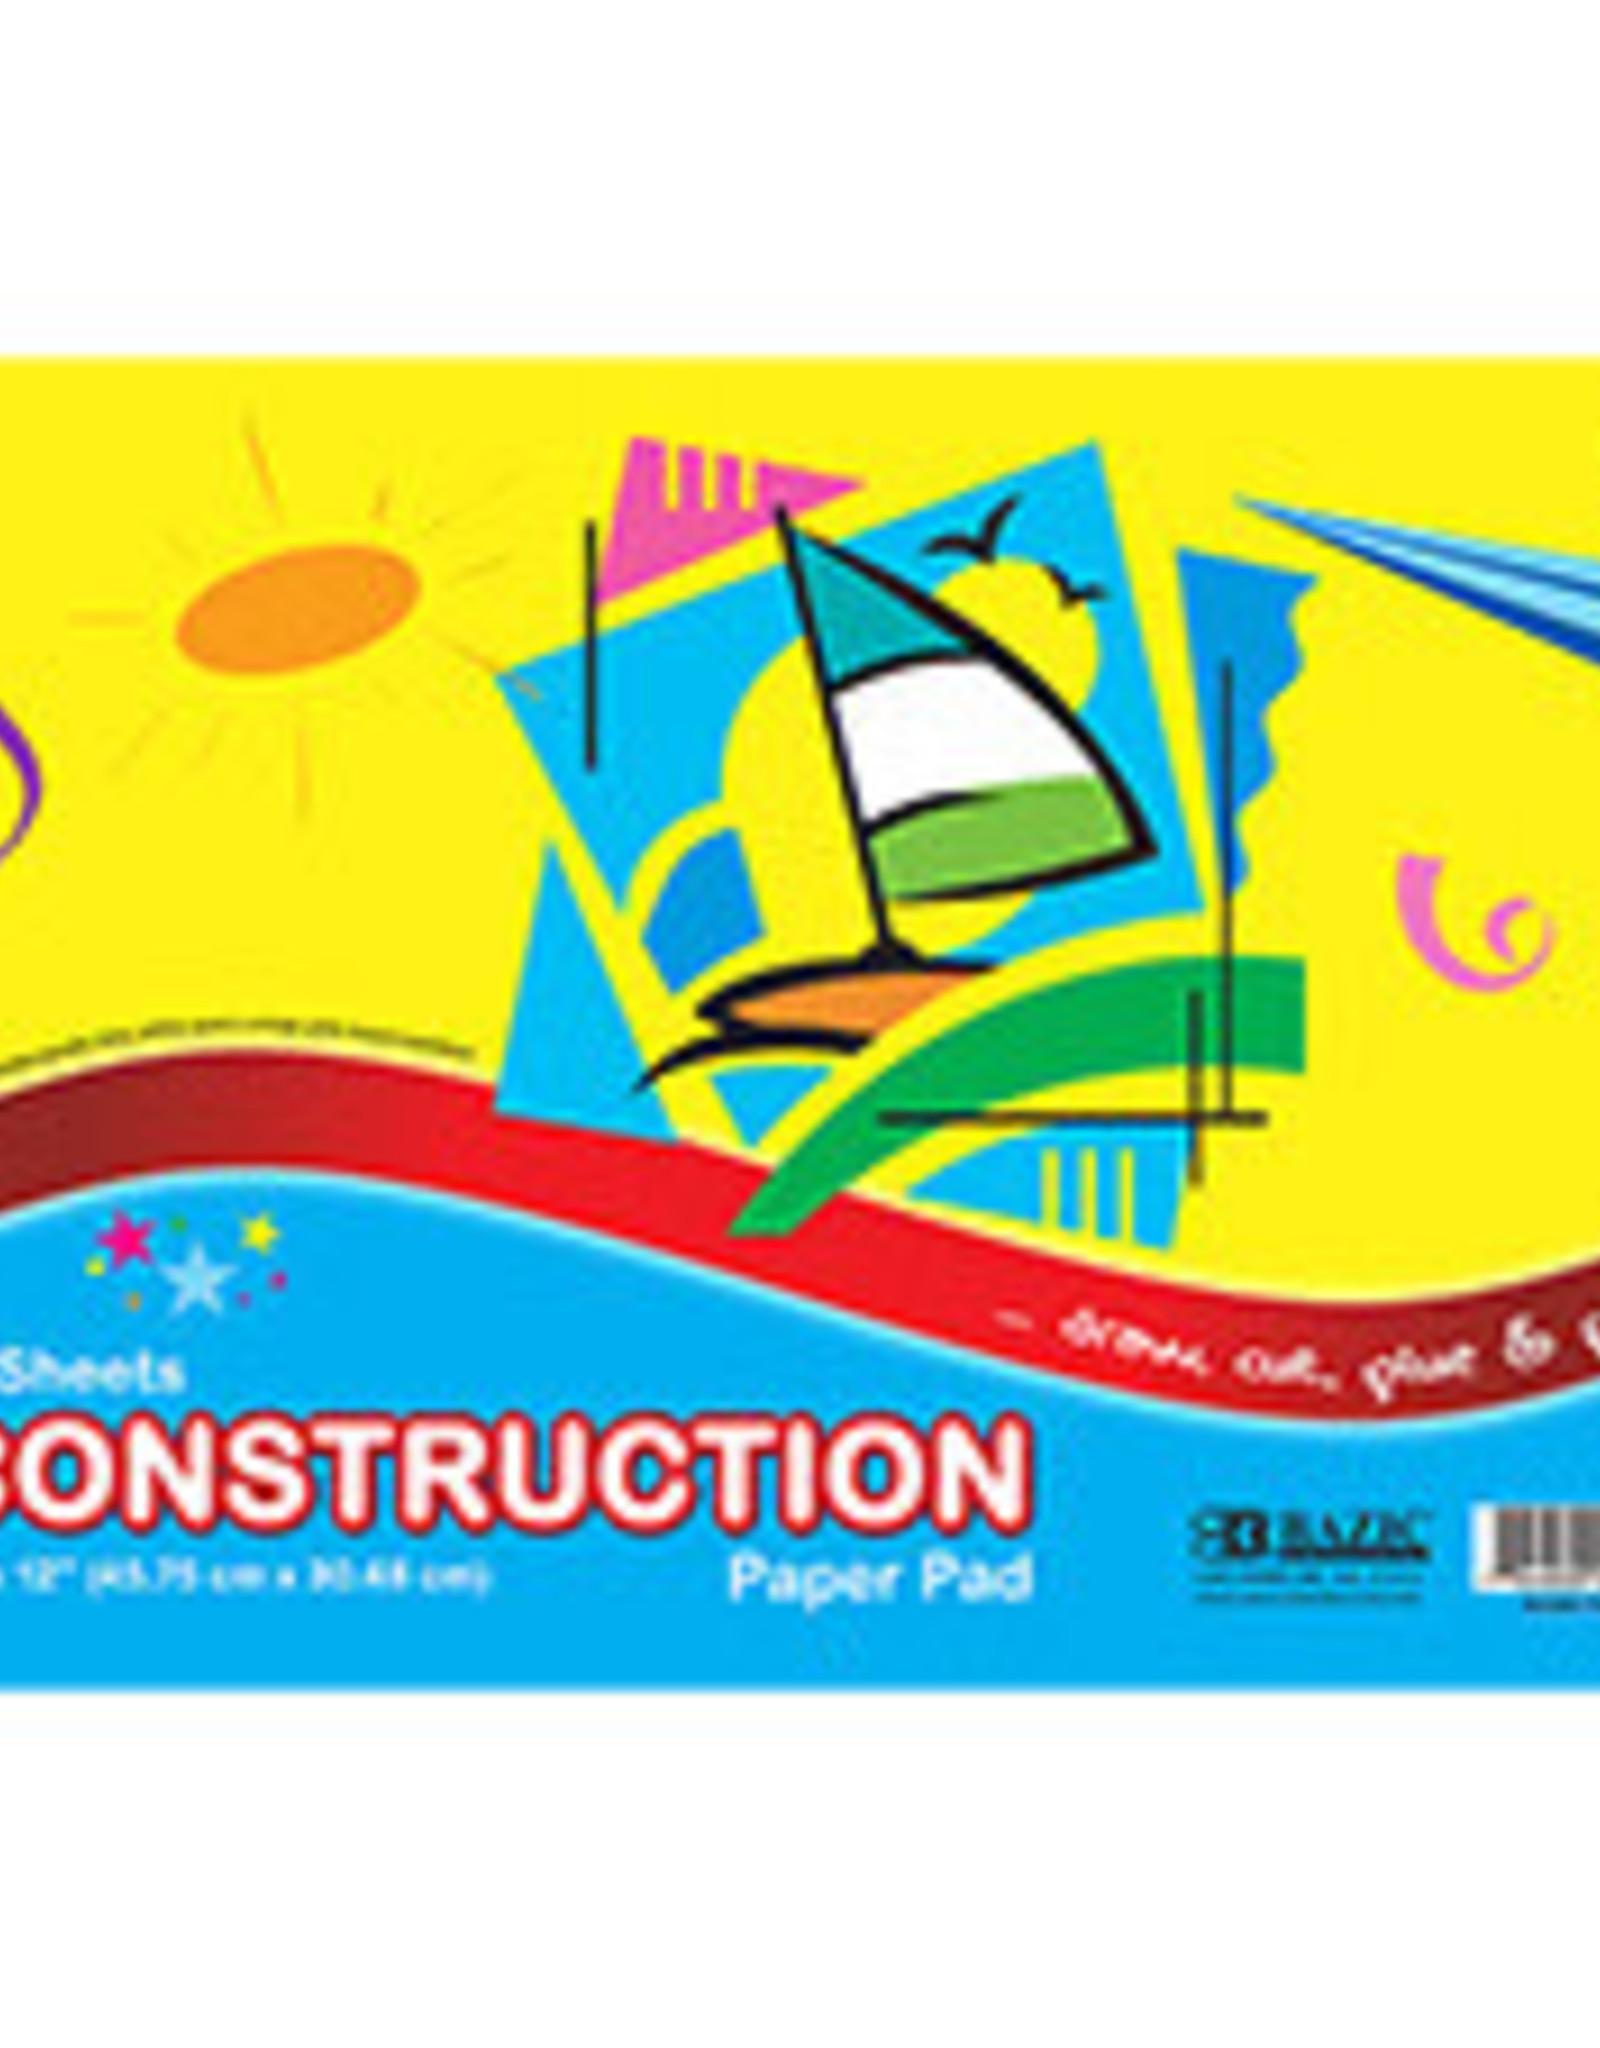 "18"" X 12"" Construction Paper Pad"